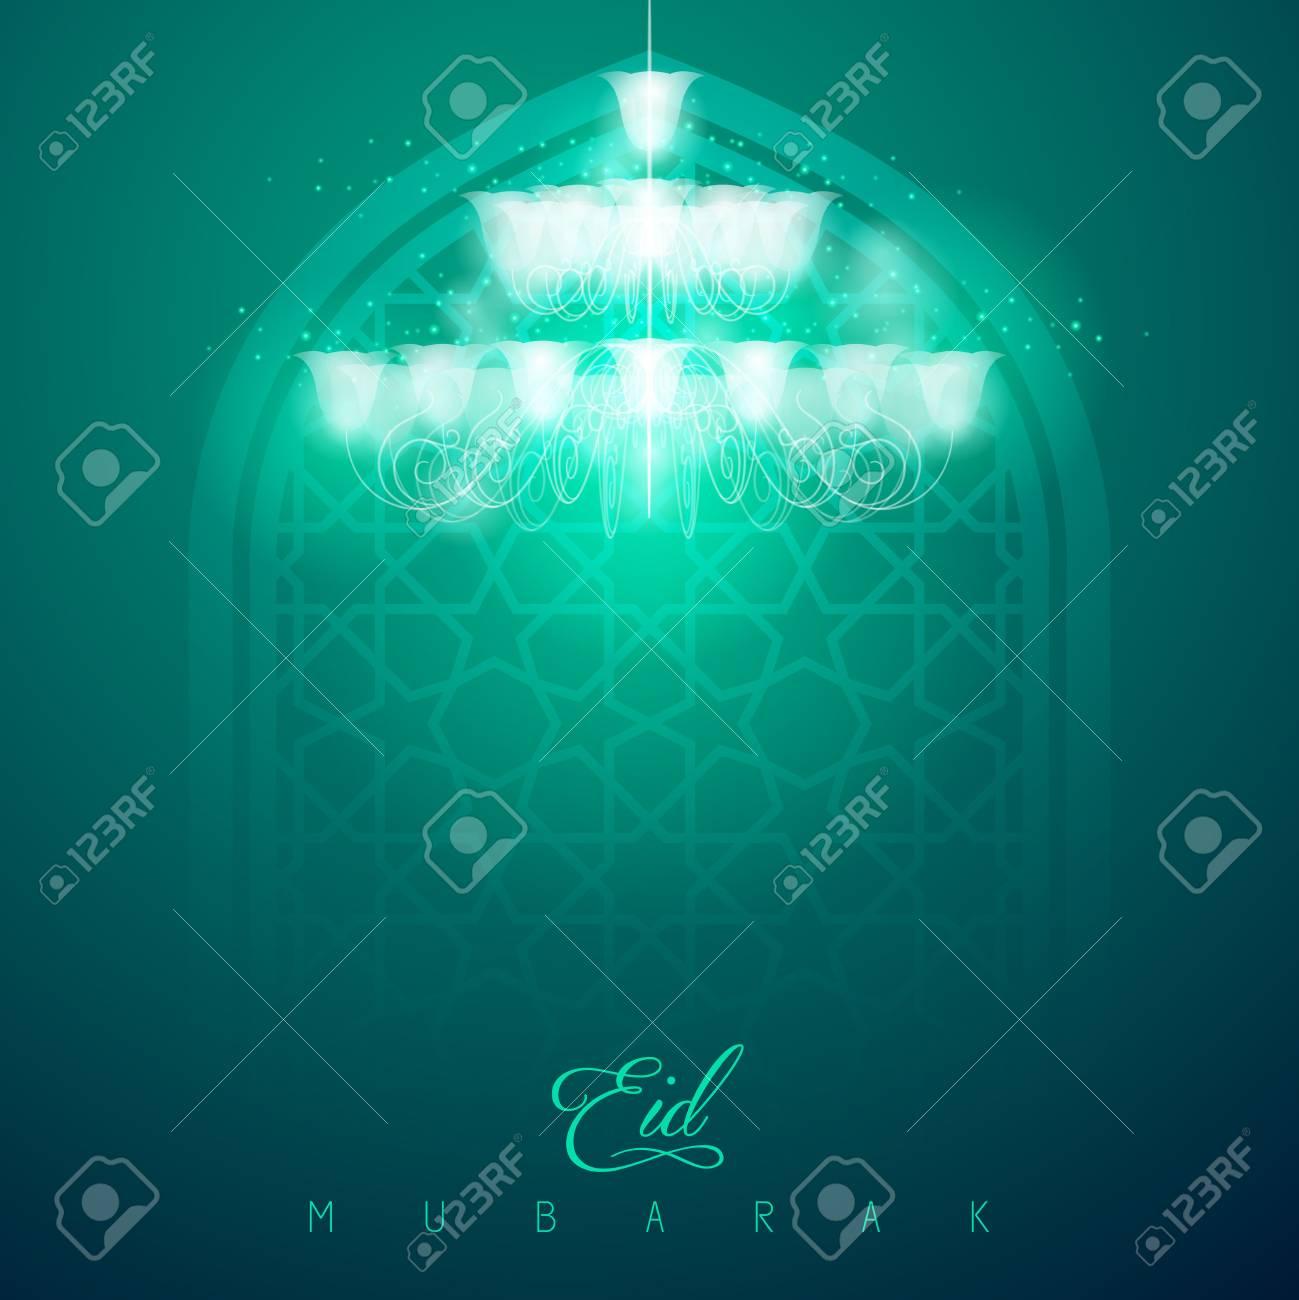 Eid mubarak greeting card background royalty free cliparts vectors eid mubarak greeting card background stock vector 57004893 m4hsunfo